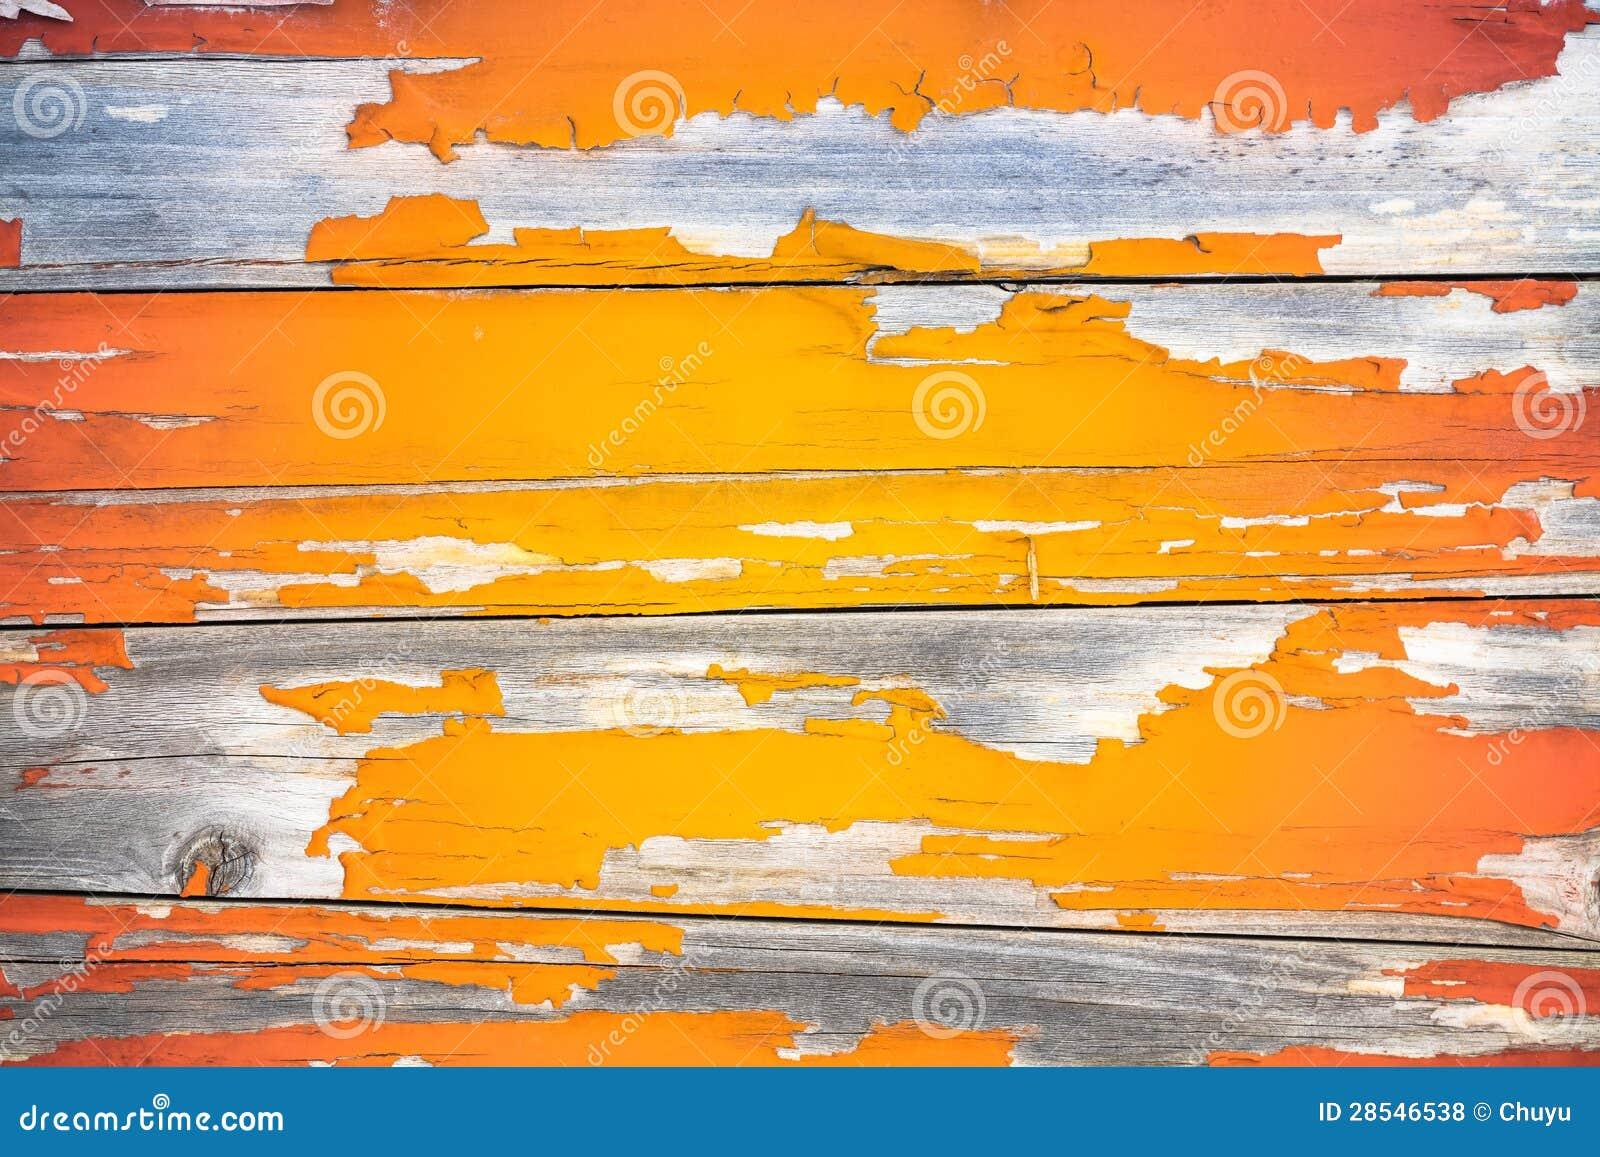 peeling paint royalty free - photo #5